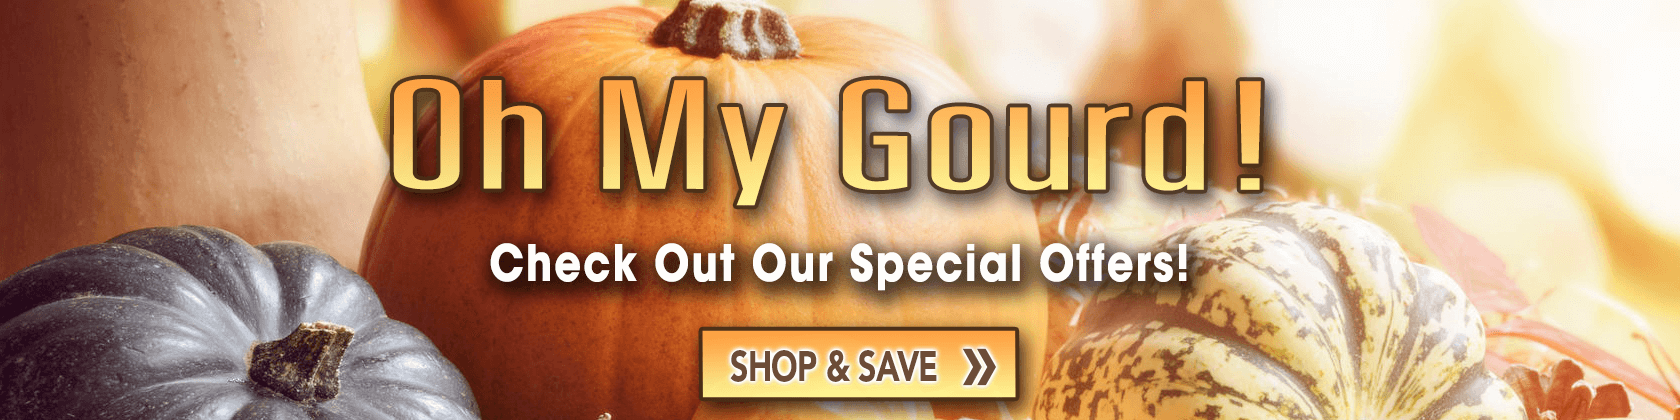 Oct 7 Special Offer Desktop